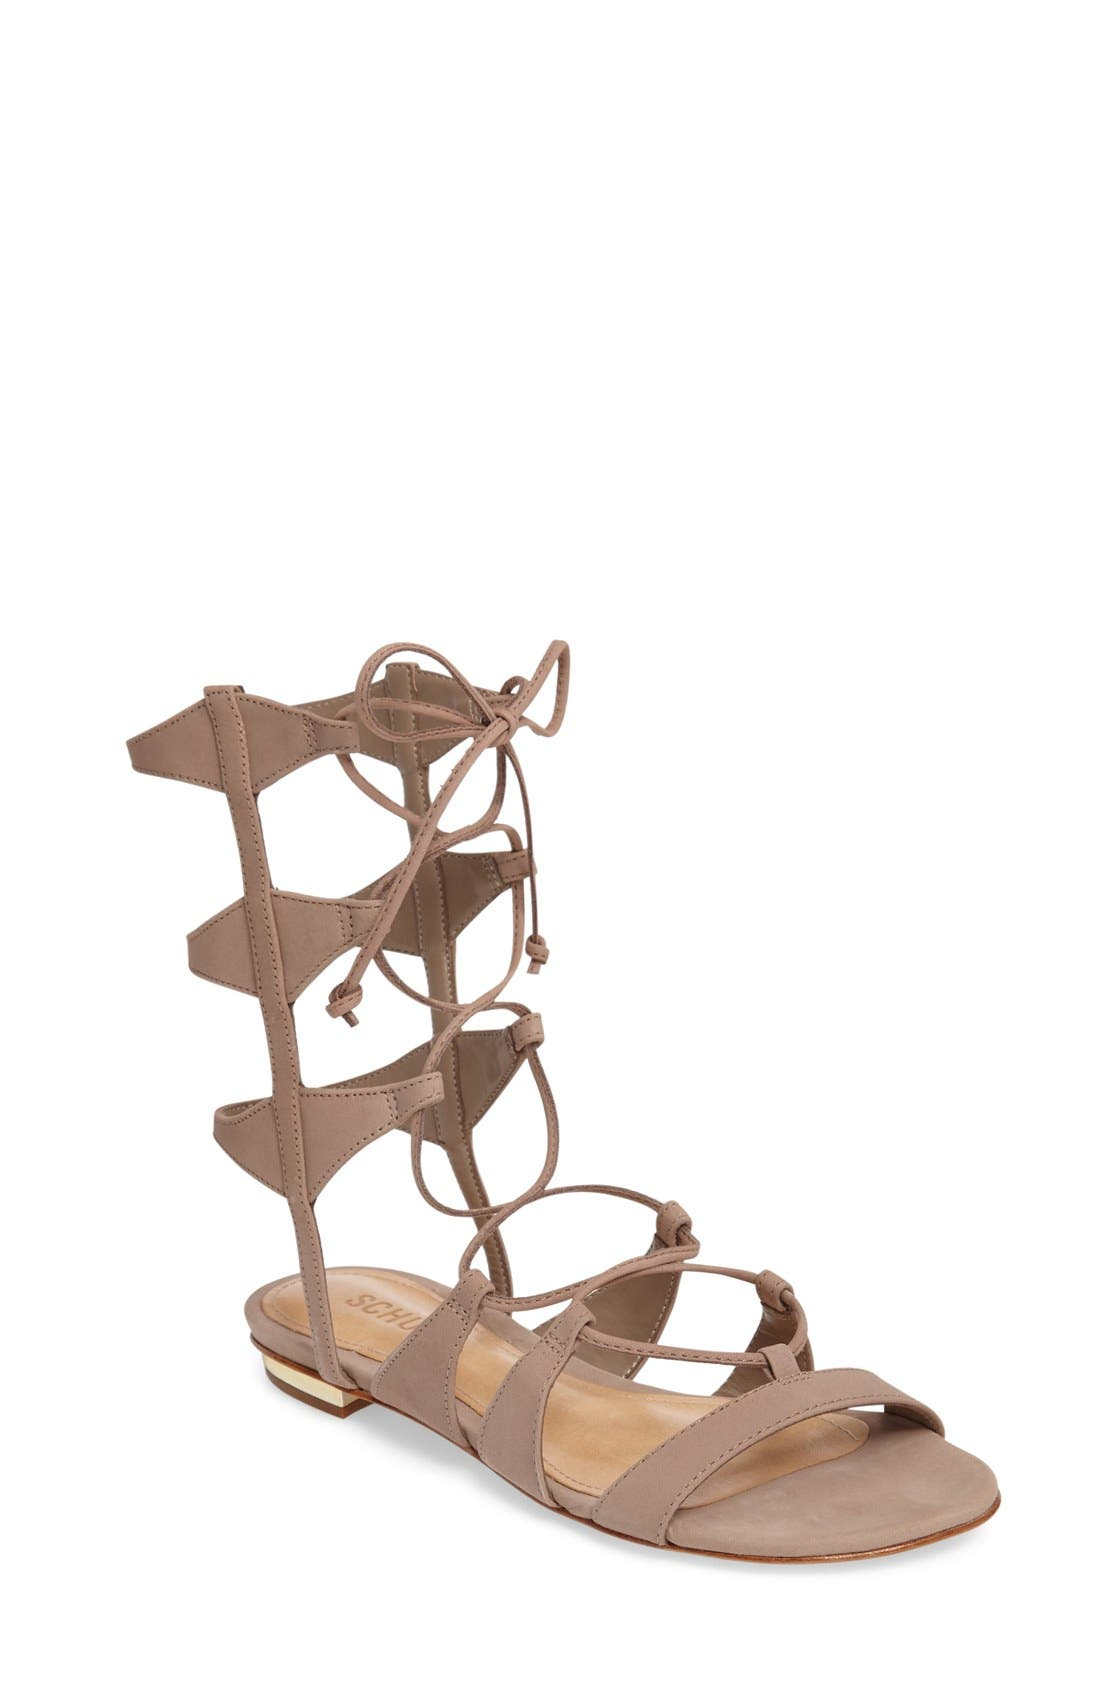 Alternate Image 1 Selected - Schutz Erlina Lace-Up Sandal (Women)